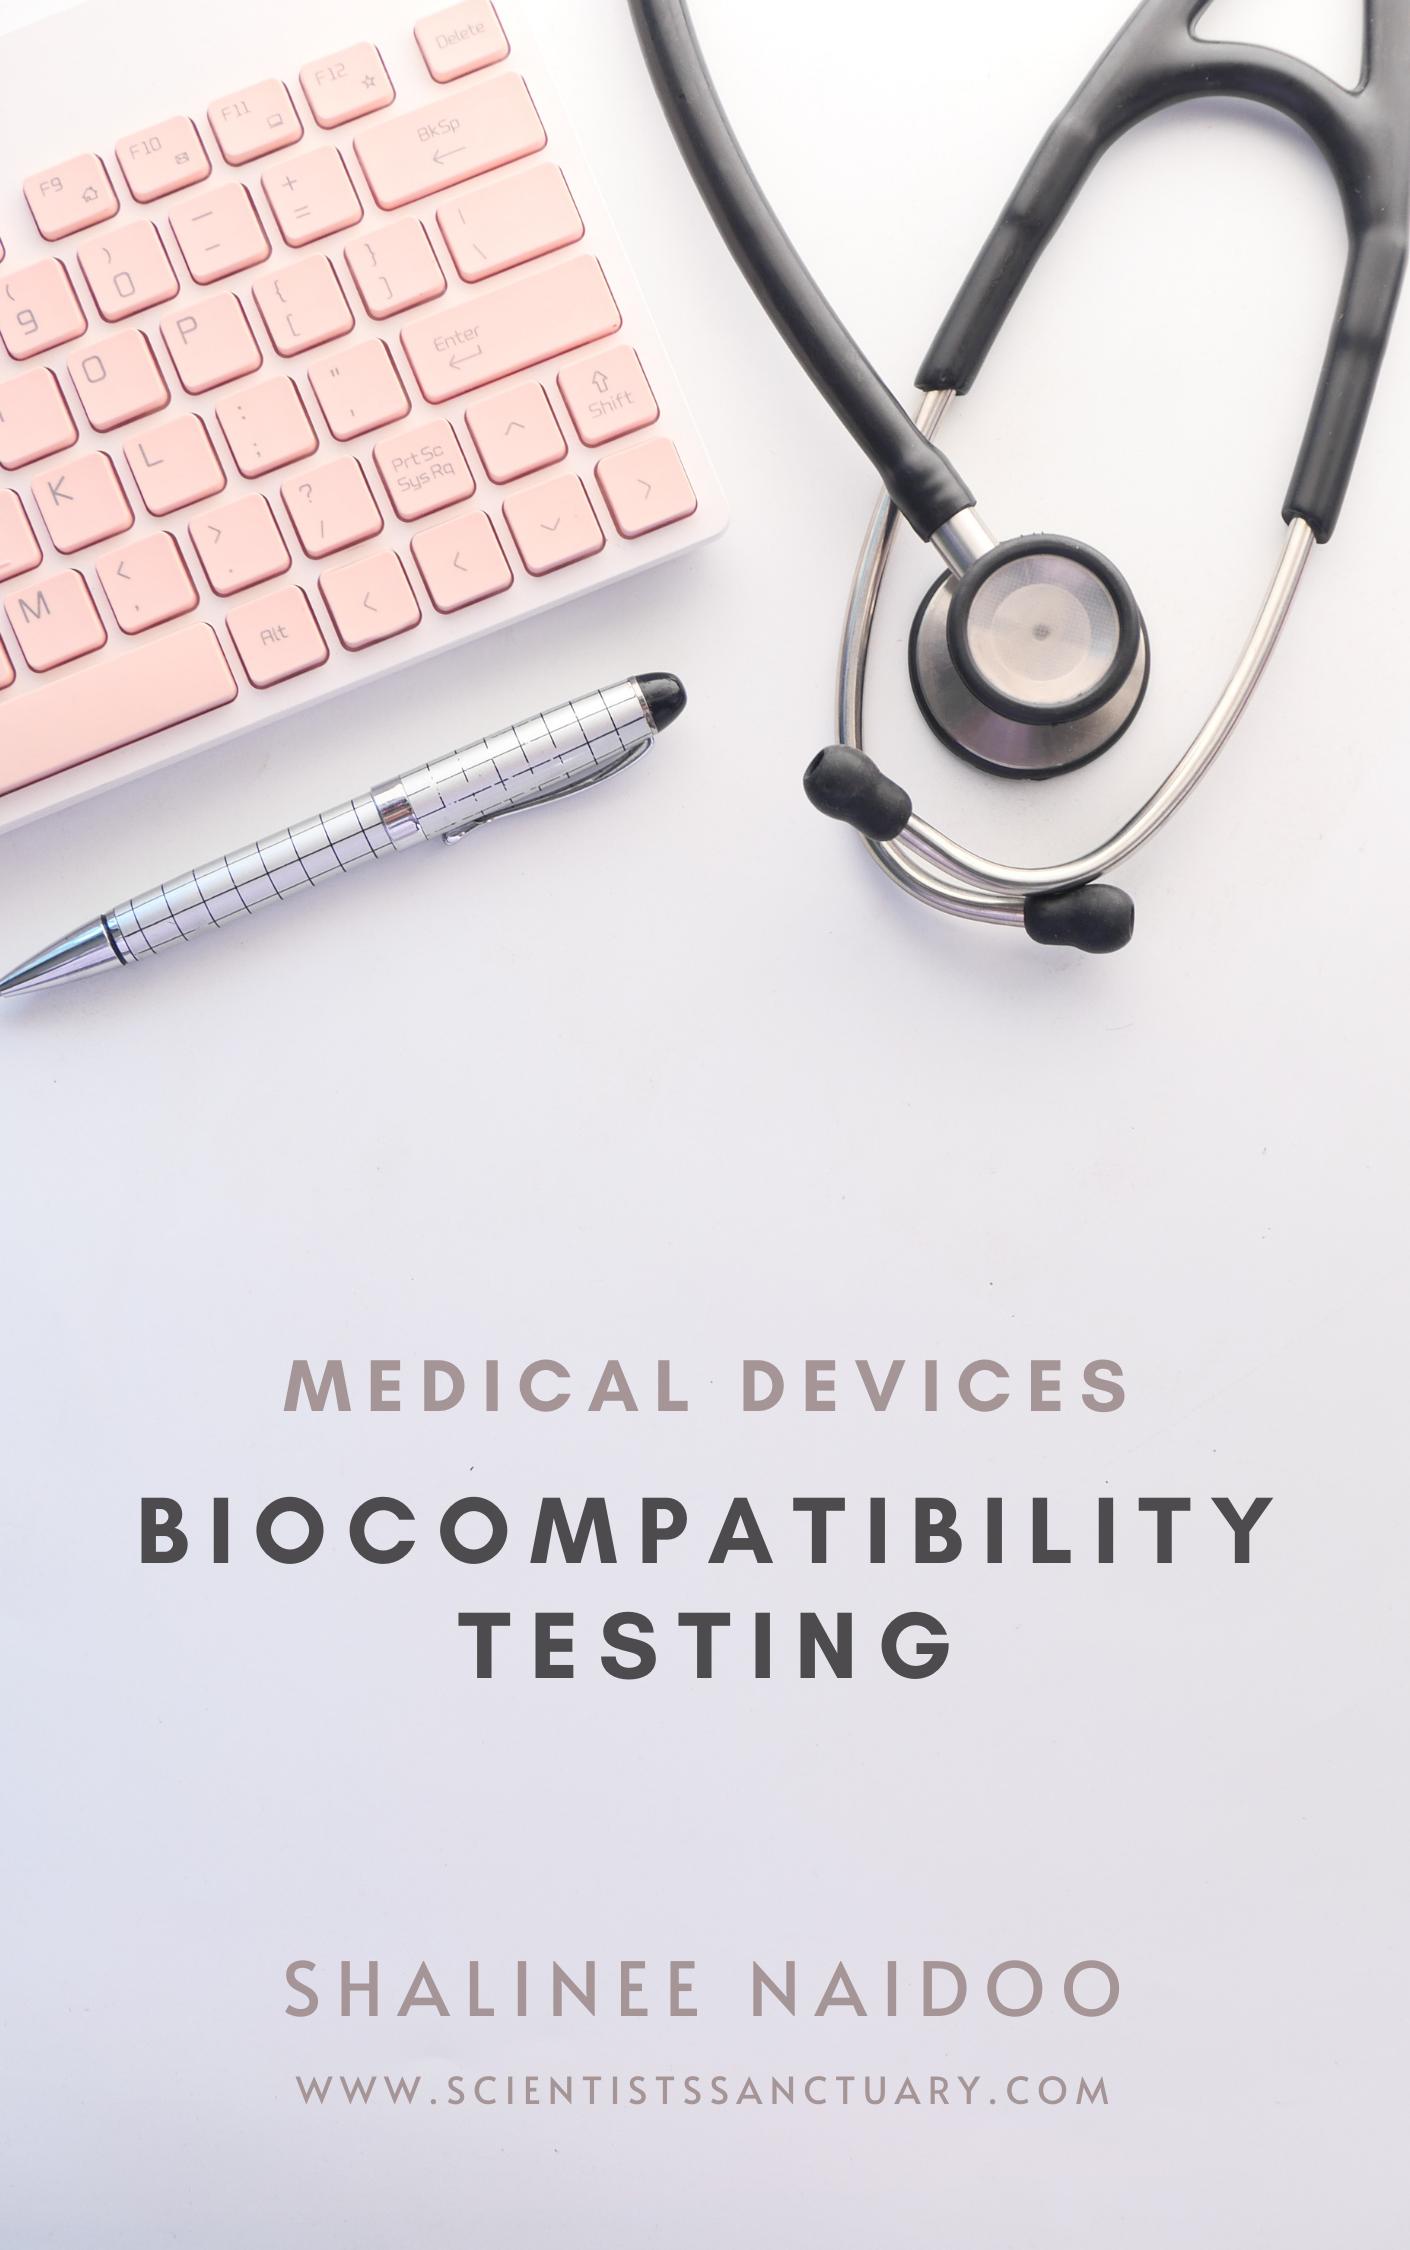 BIOCOMPATIBILITY TESTING -SCIENTISTS SANCTUARY